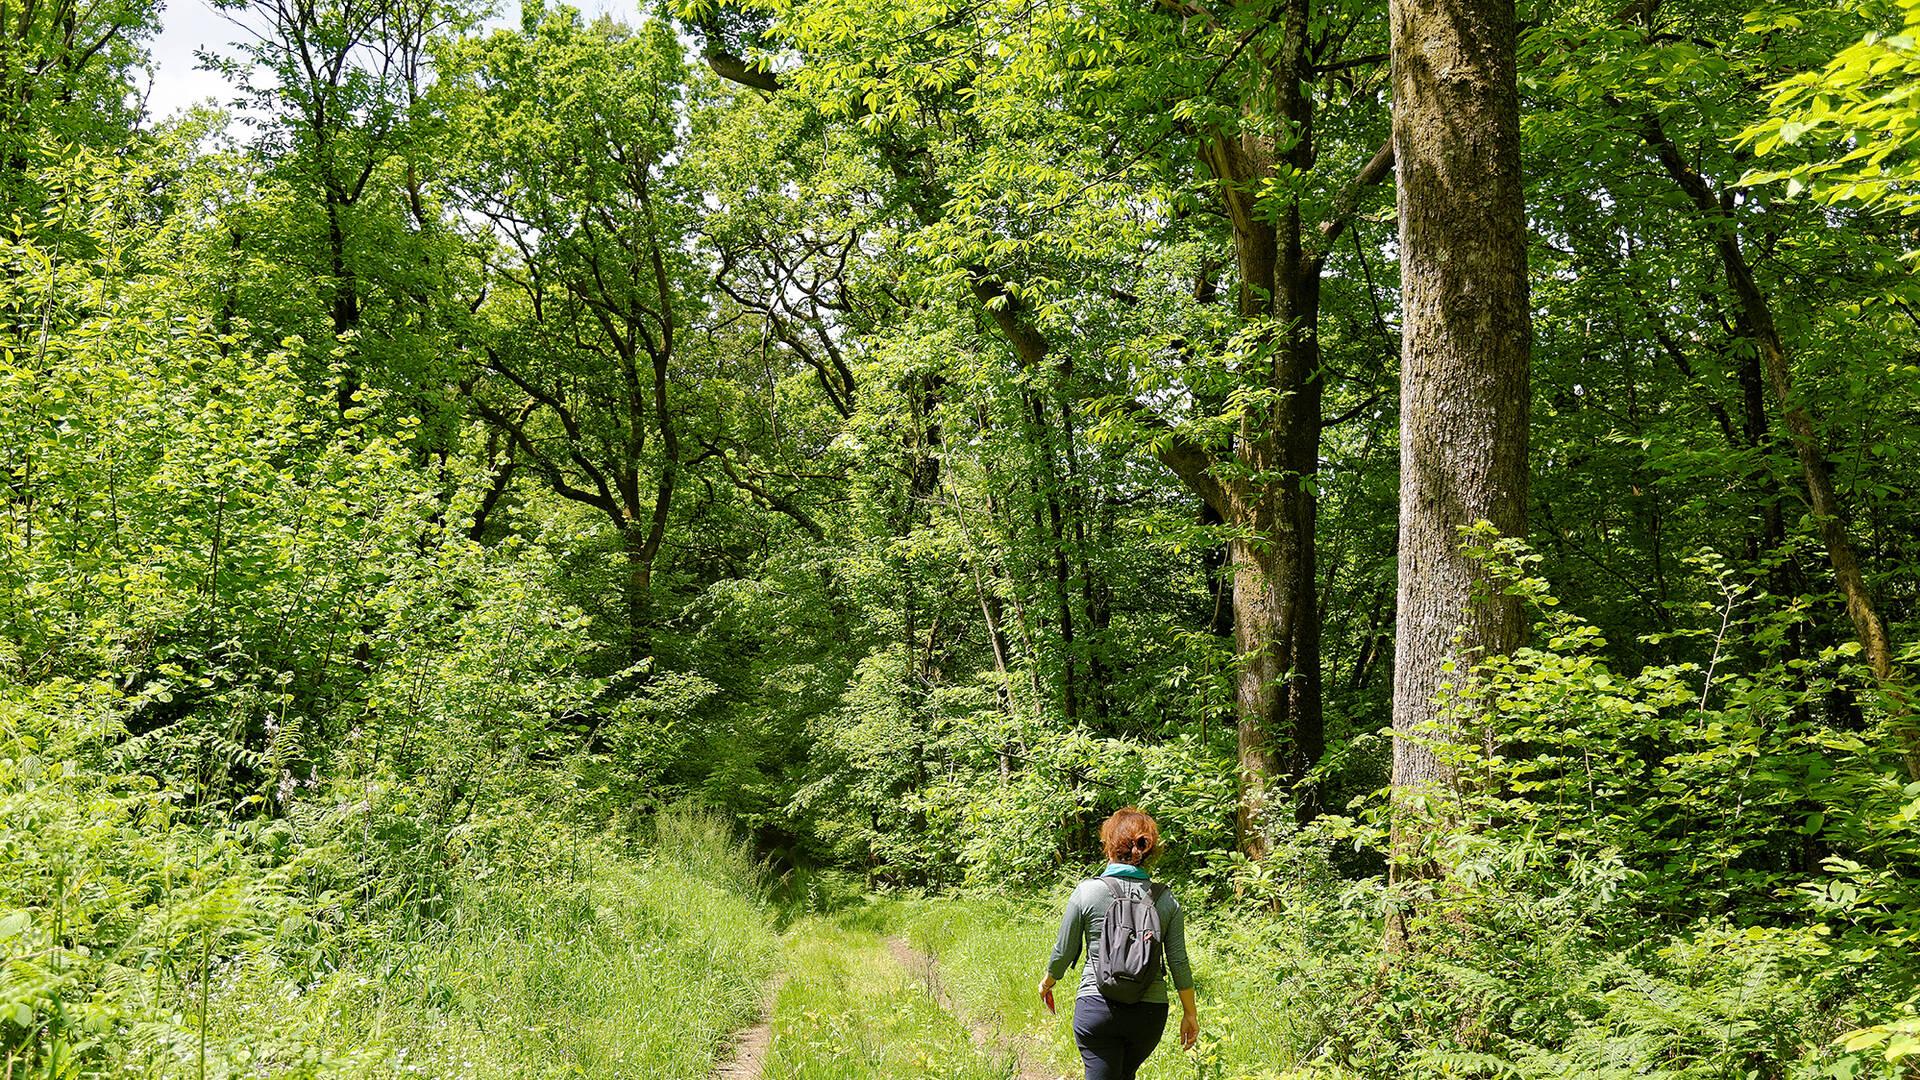 Randonnée en forêt de Chantemerle @PWallCD79